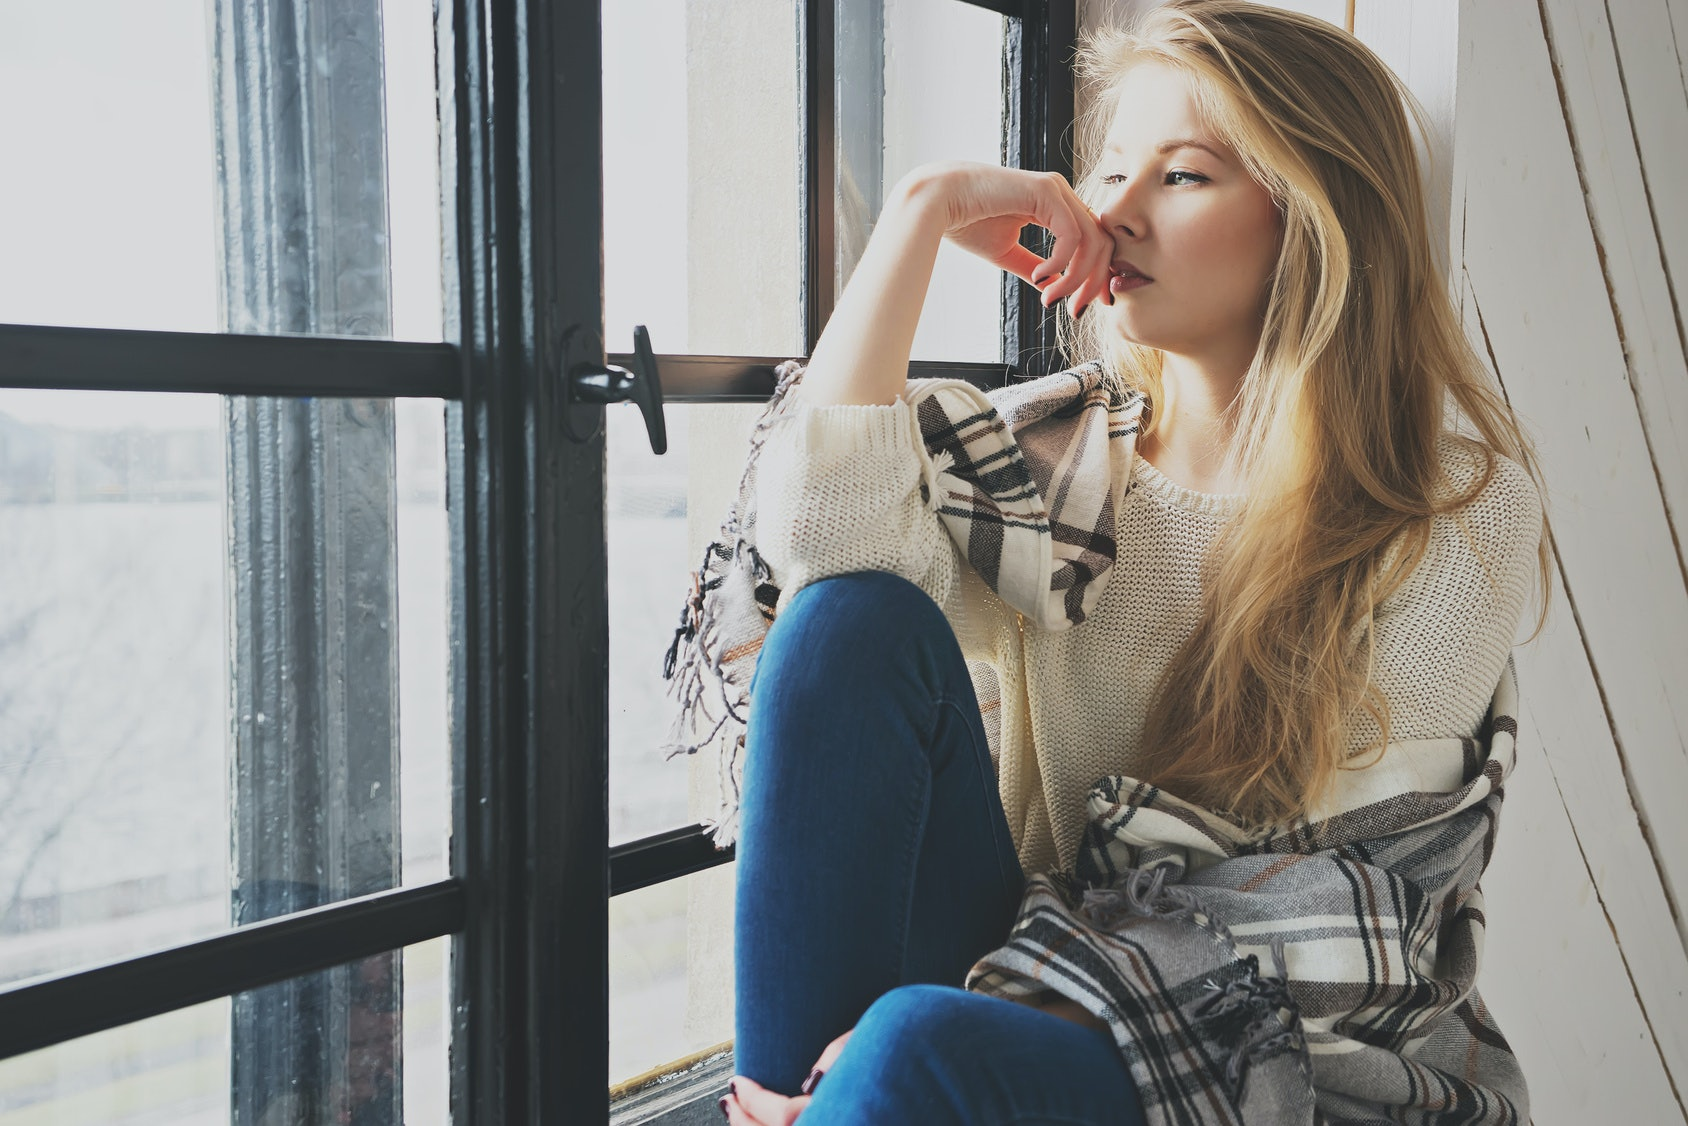 how to rebuild self esteem after an affair